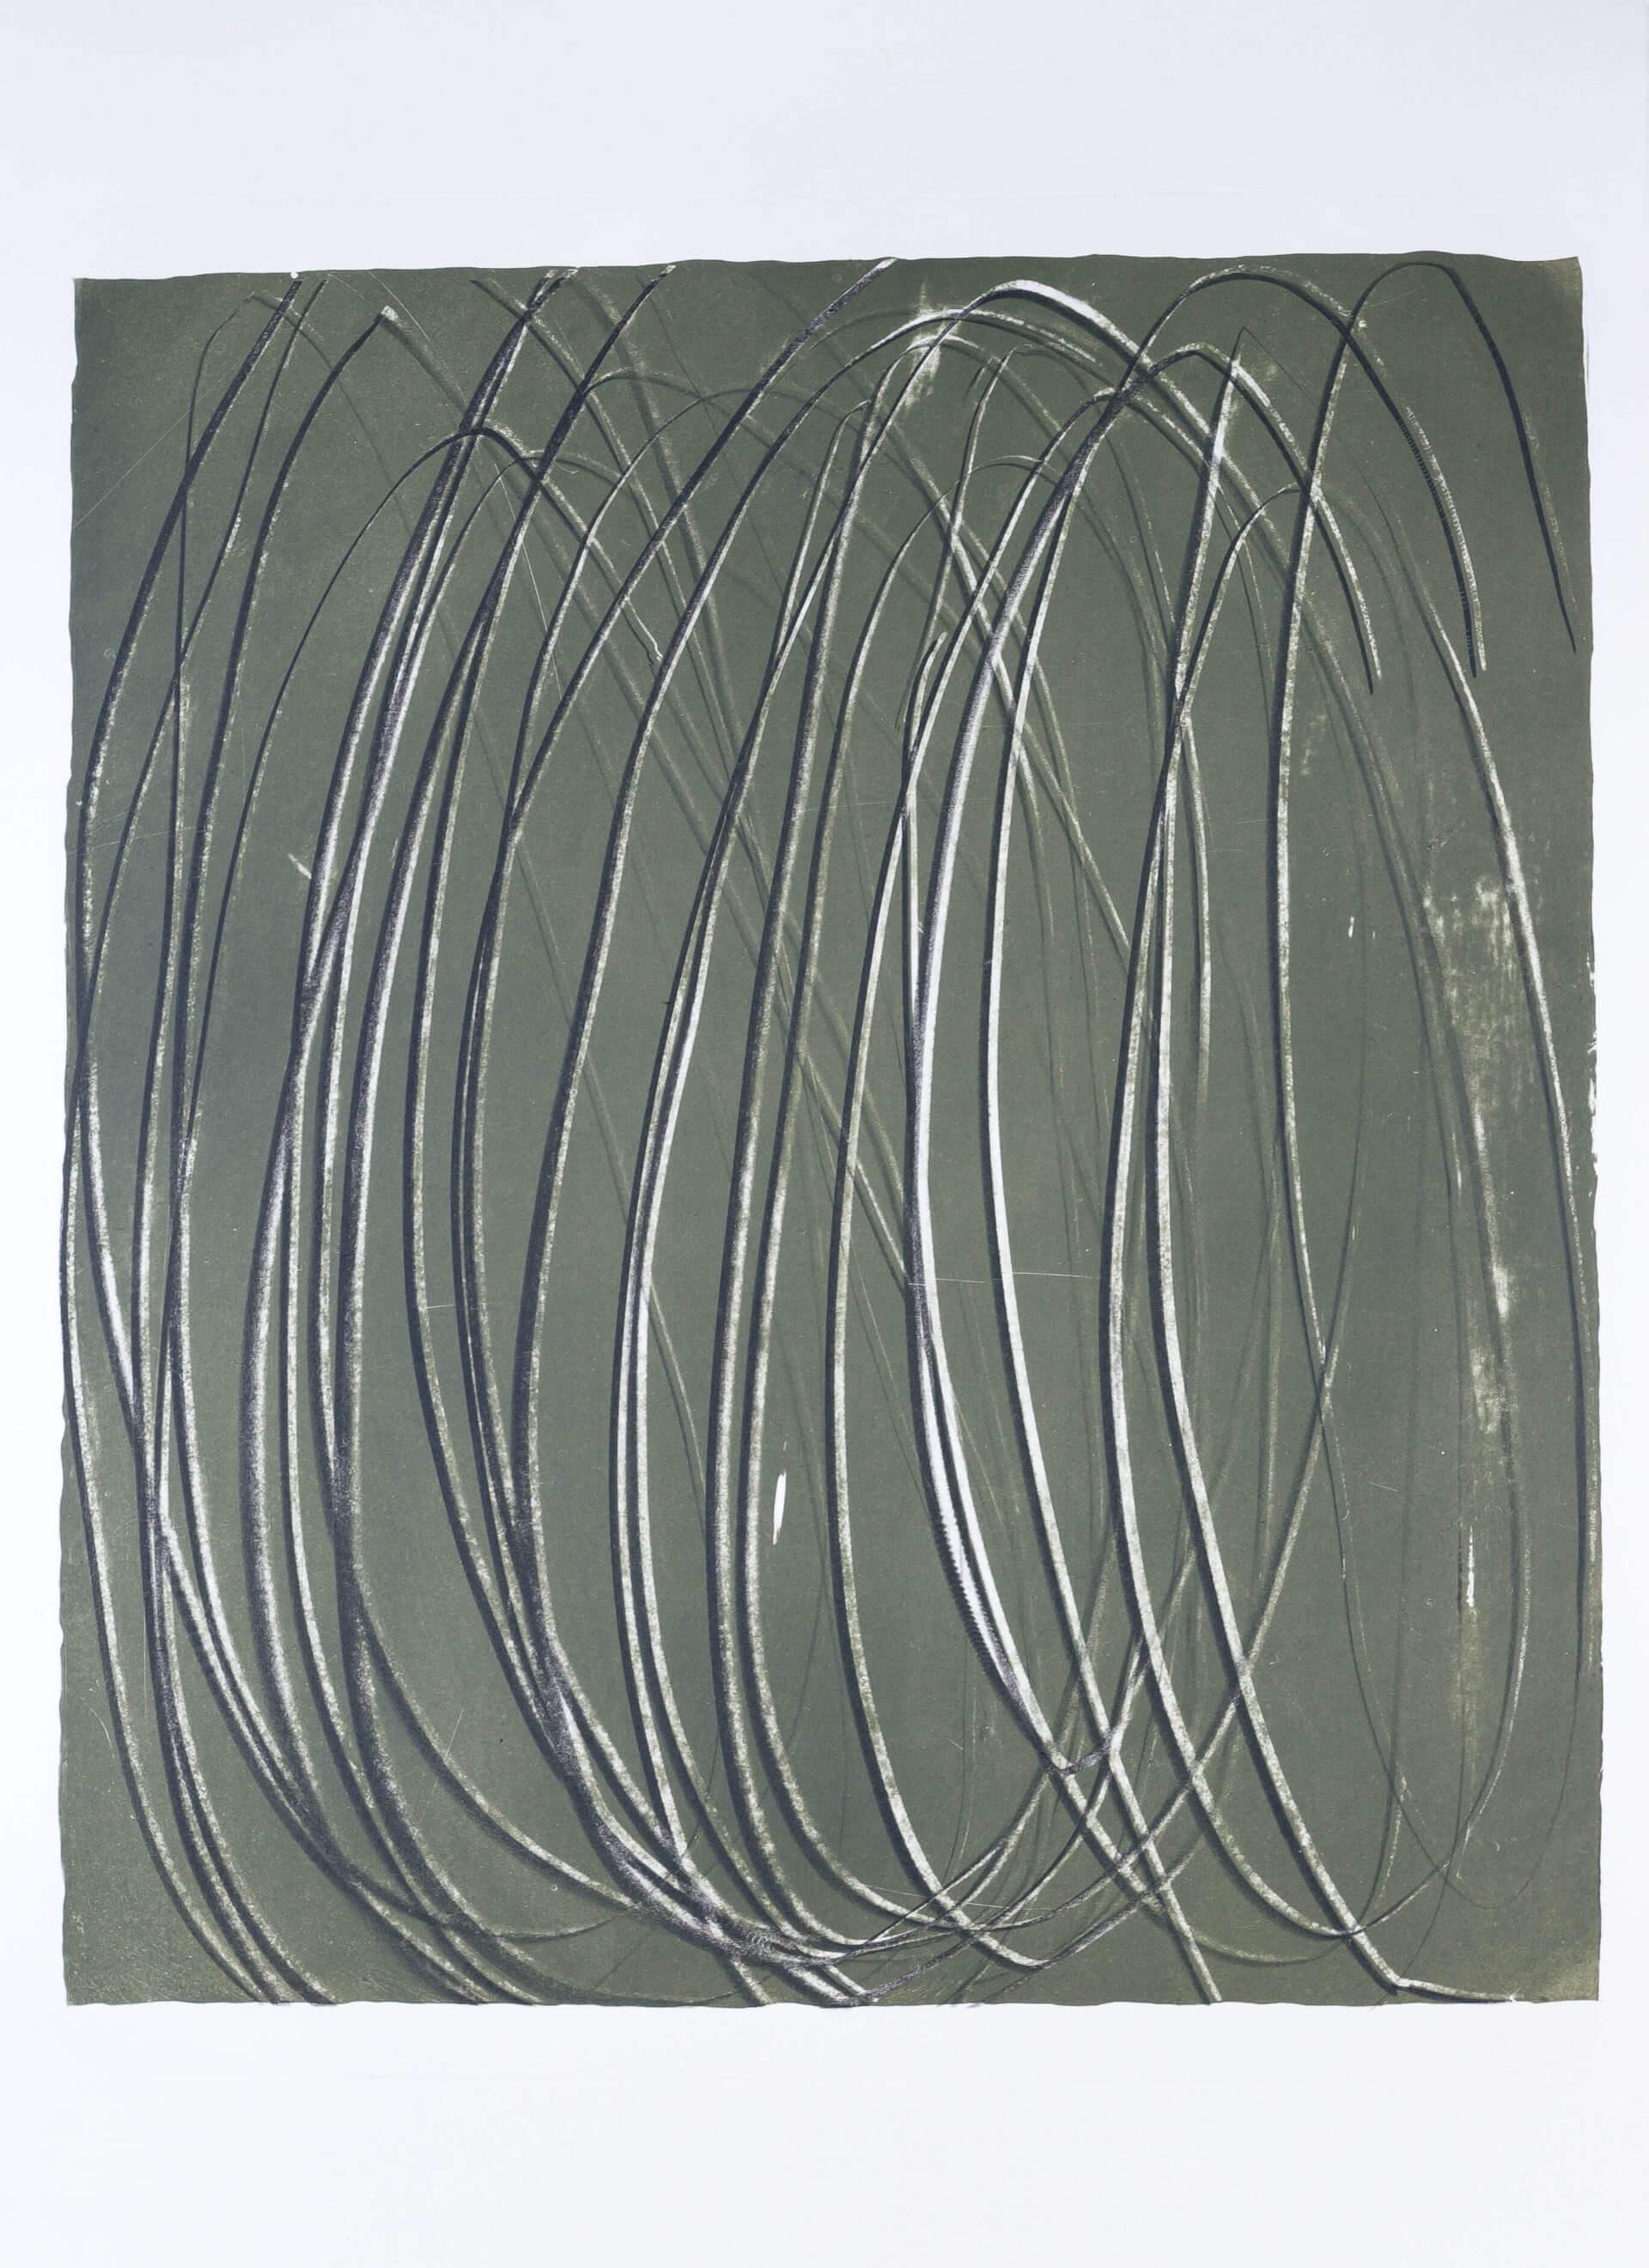 Katharina Albers, Transformation XIII, 2011, Farblithographie, 5 Auflagen, 59,5x48,5cm